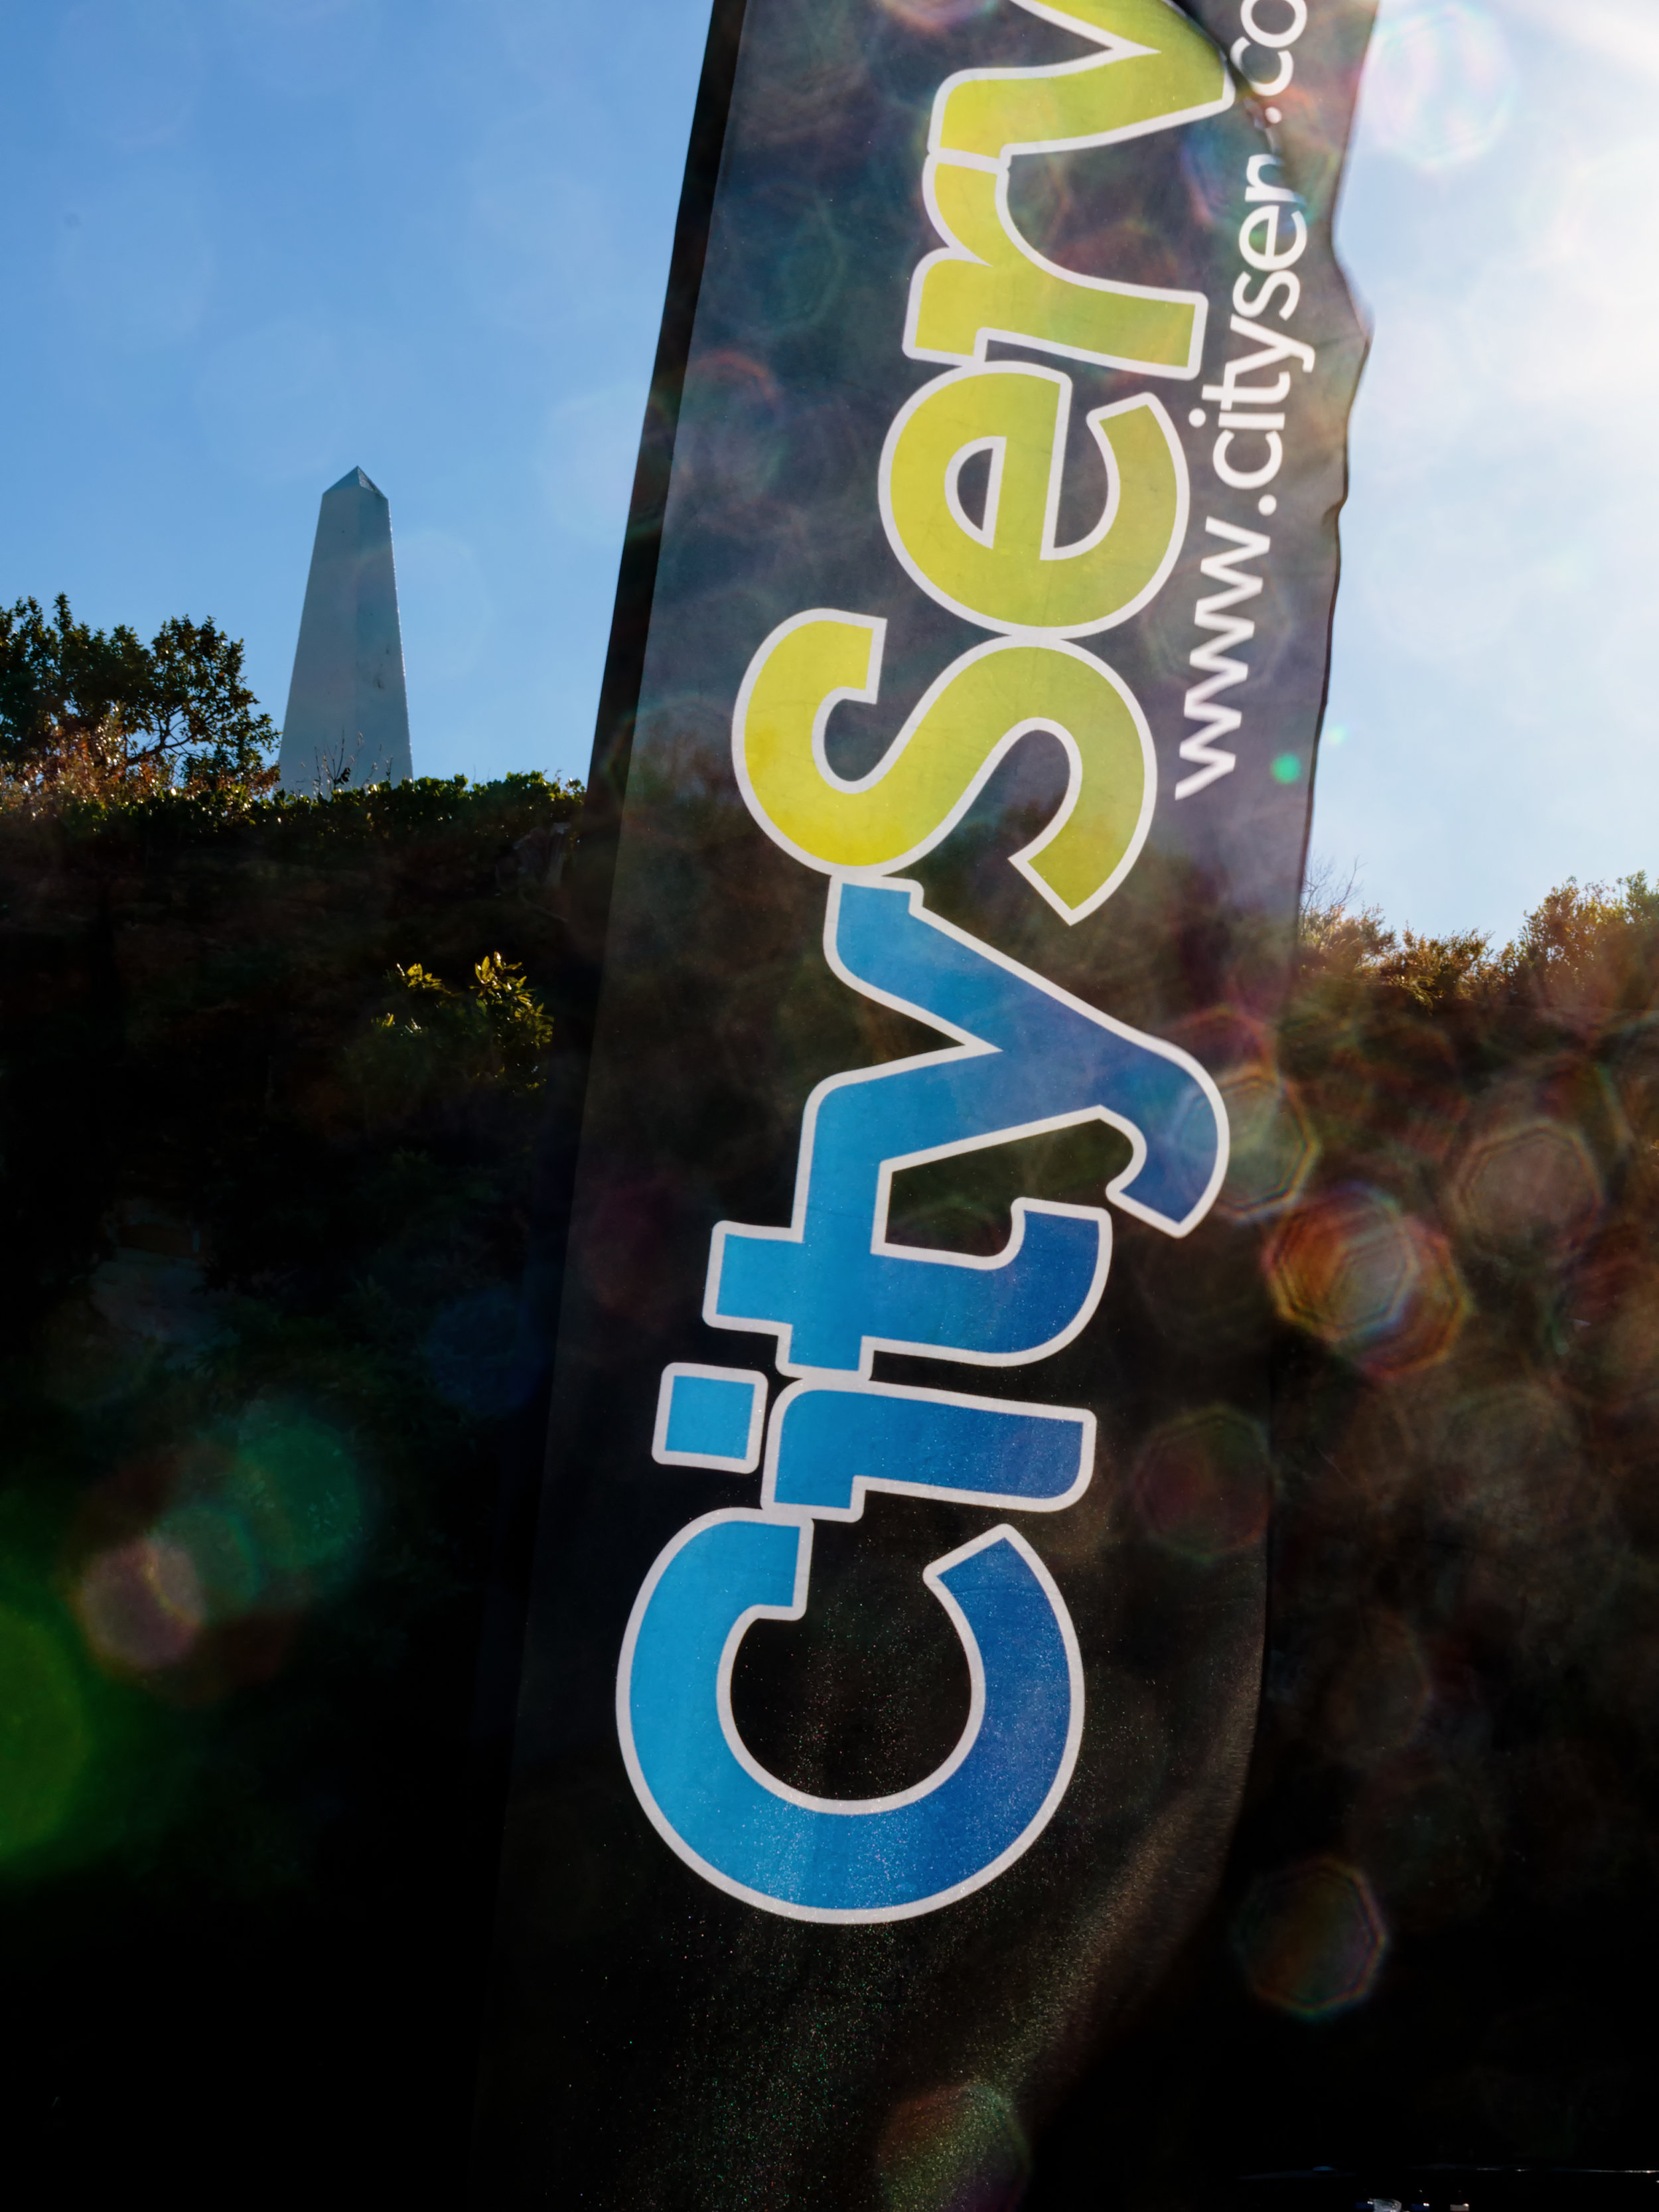 CityServe_C3NC_6.jpg